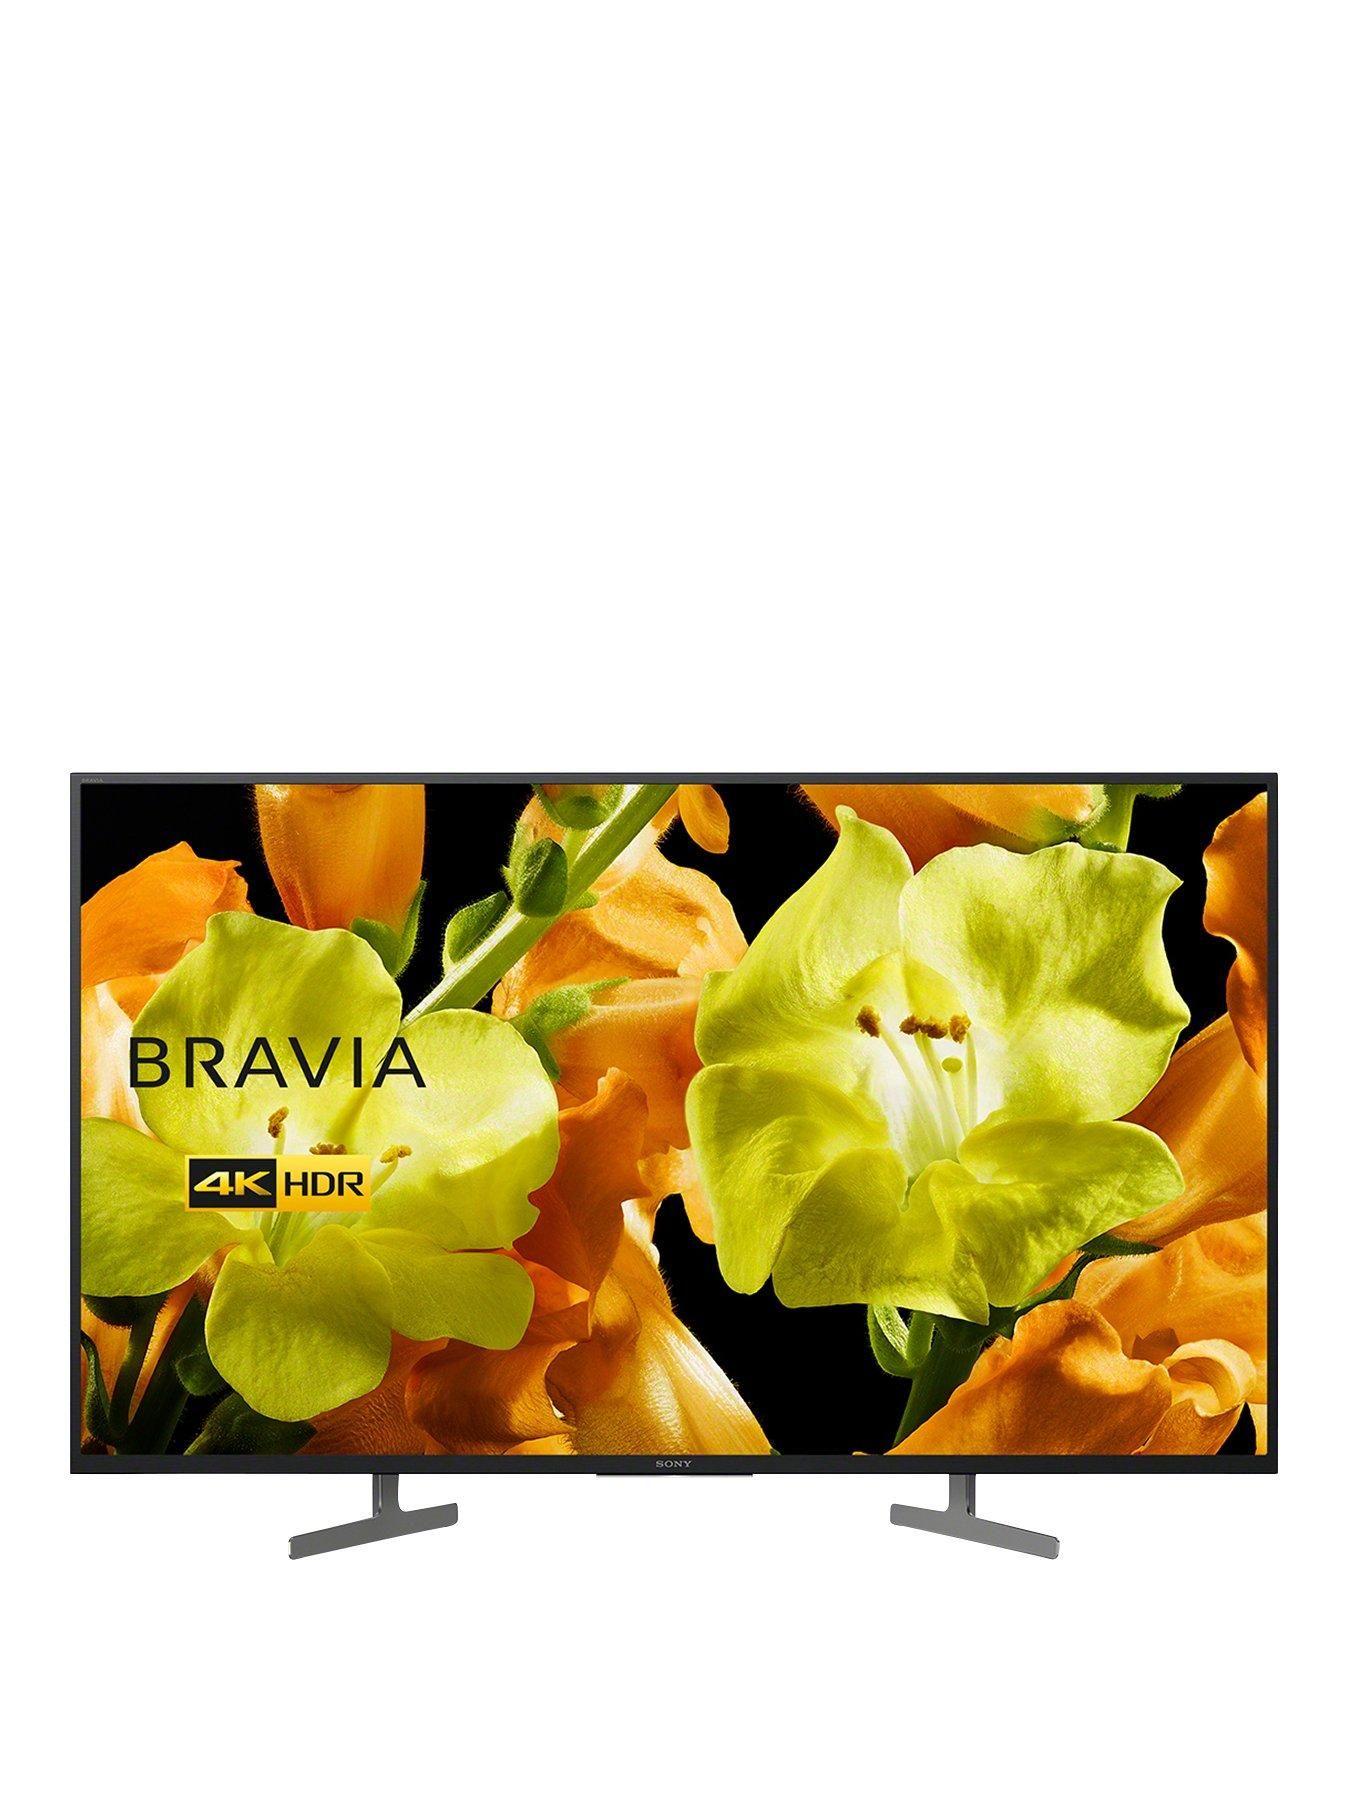 Bravia Kd43xg81 43 Inch 4k Ultra Hd Hdr Smart Tv Black